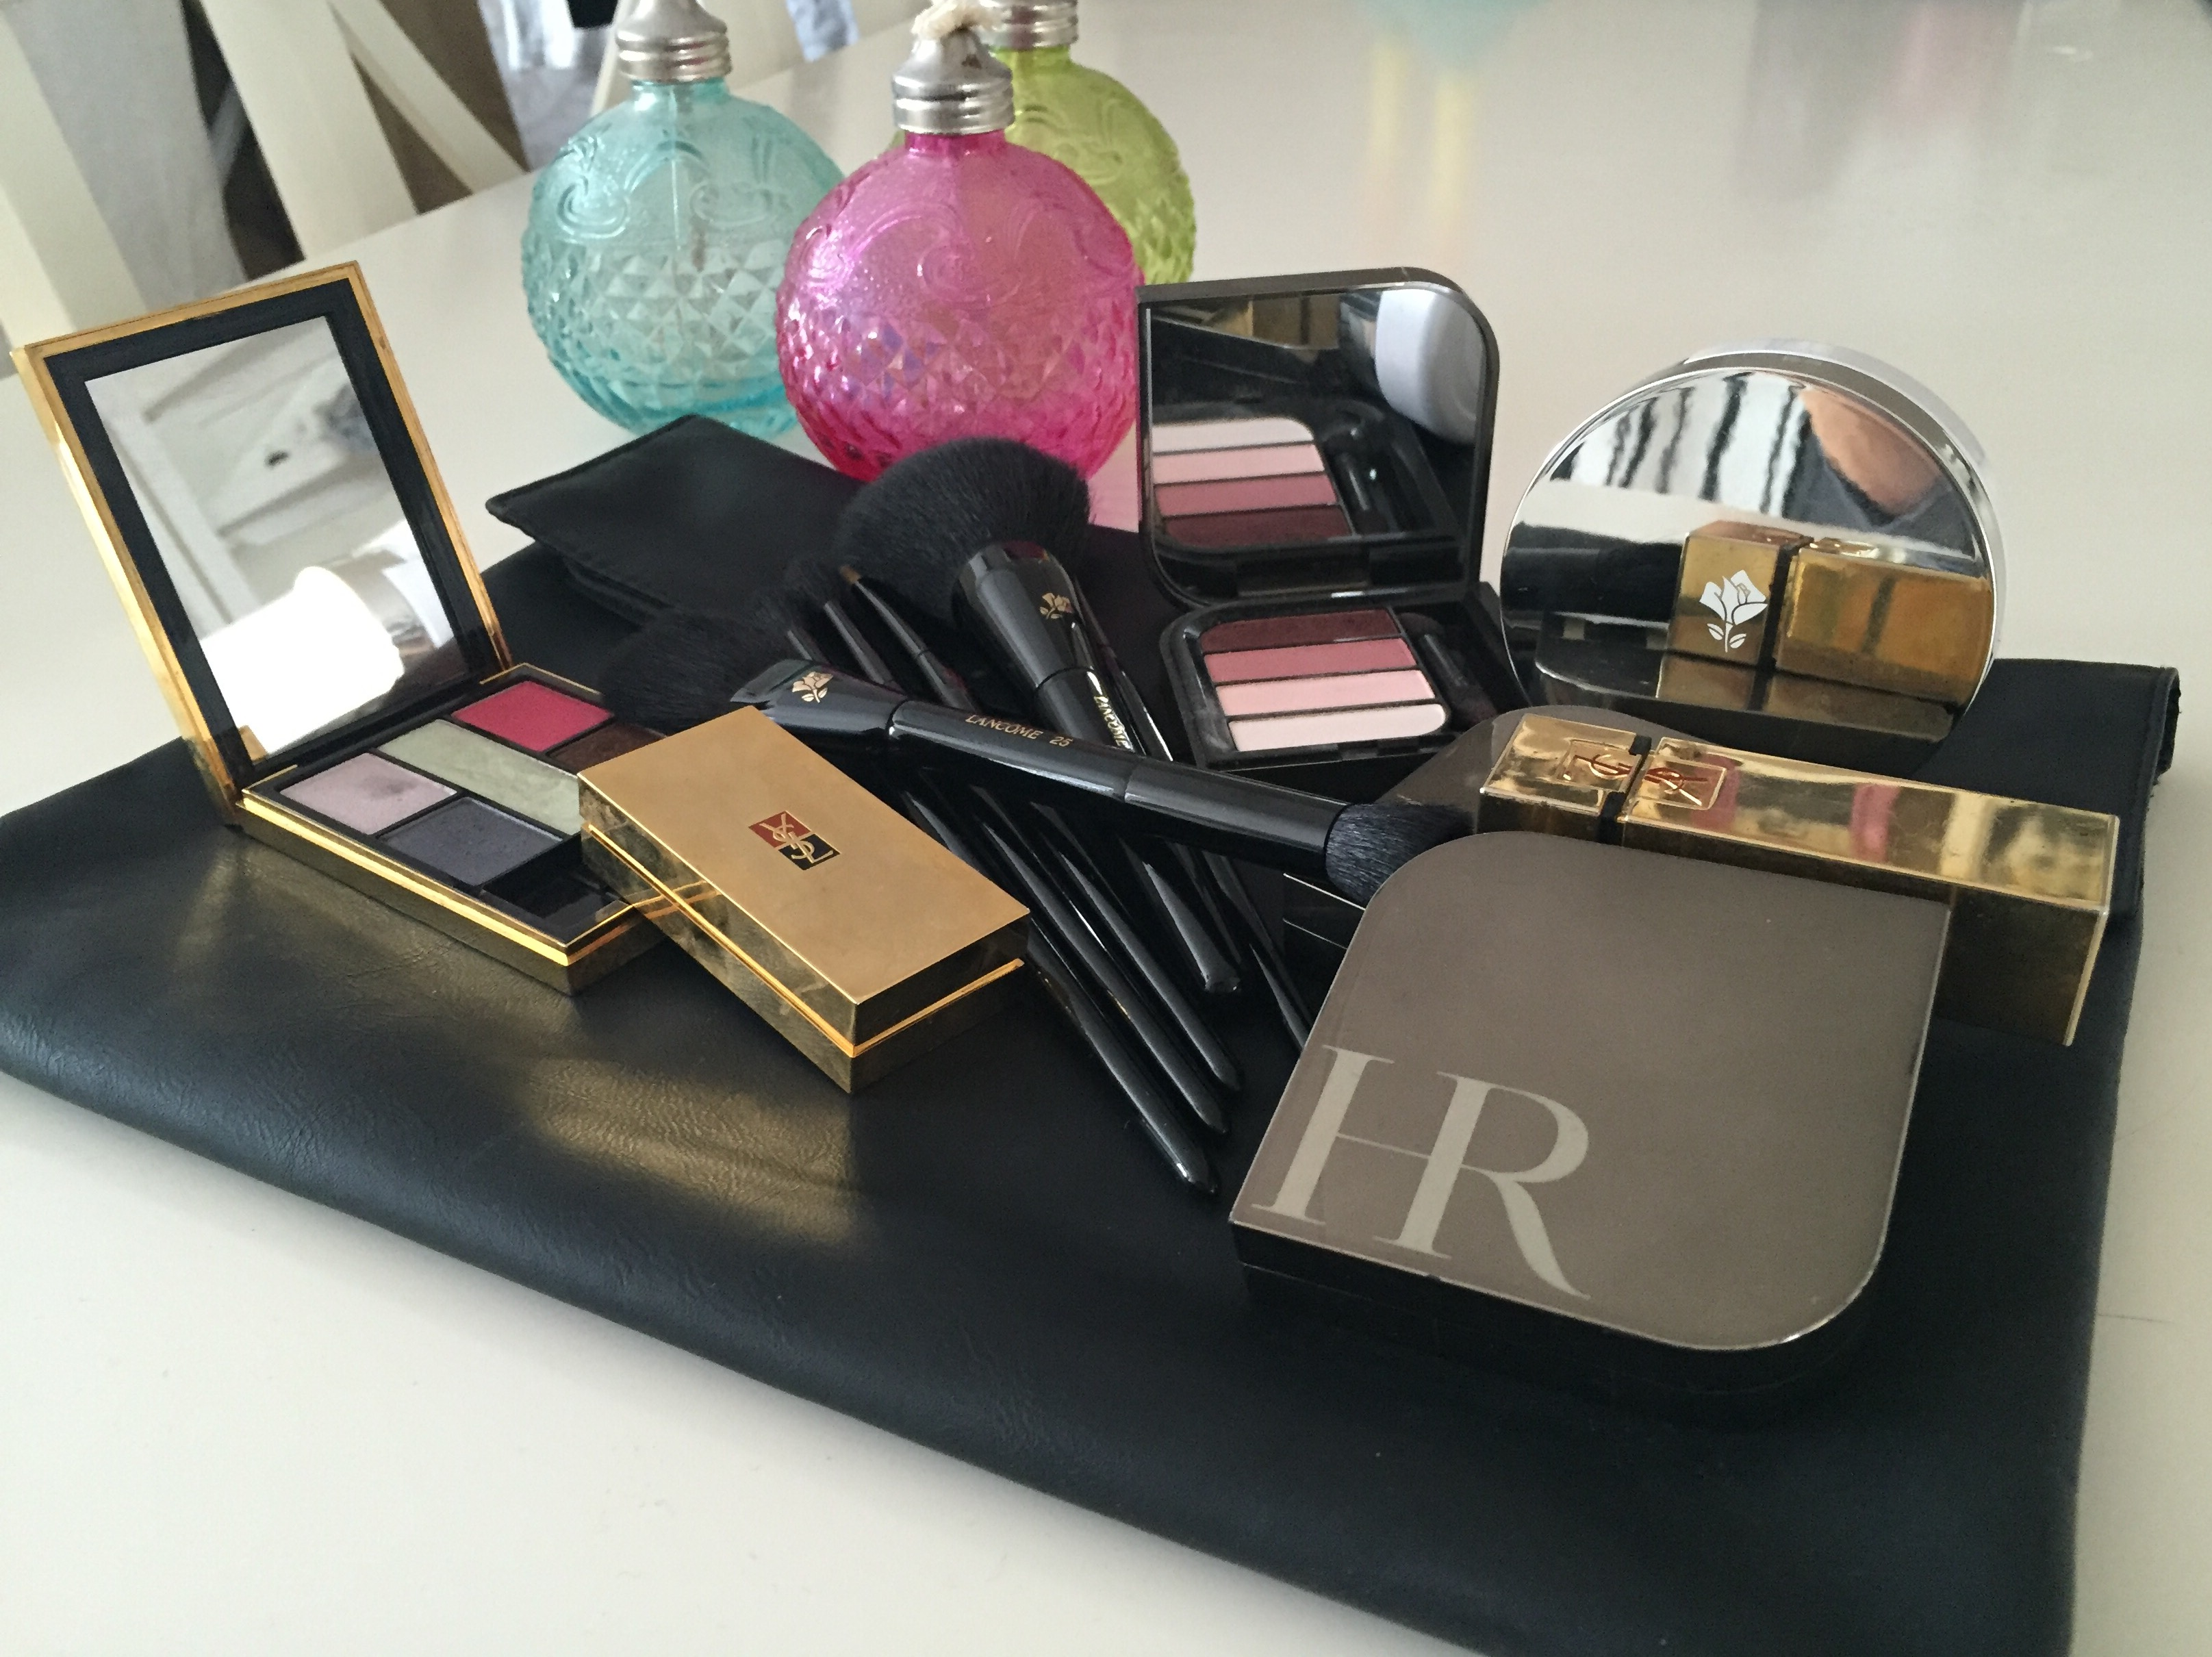 makeupkurs makeup Lancome Ysl